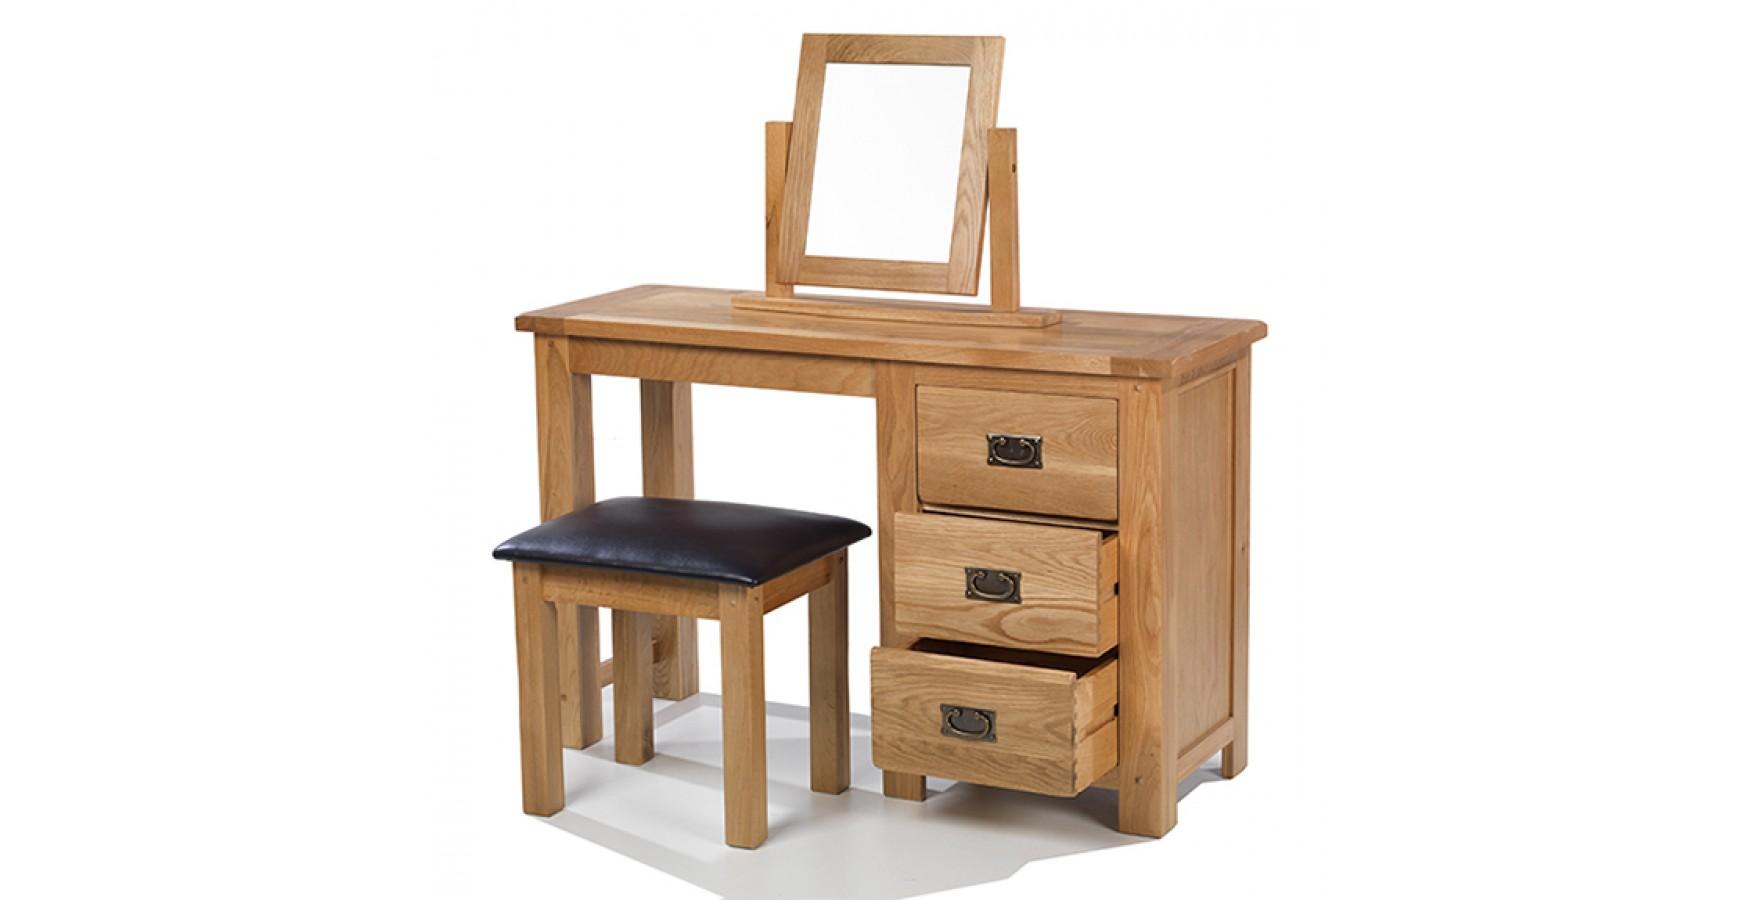 Rustic Oak Dressing Table Set - Lifestyle Furniture UK